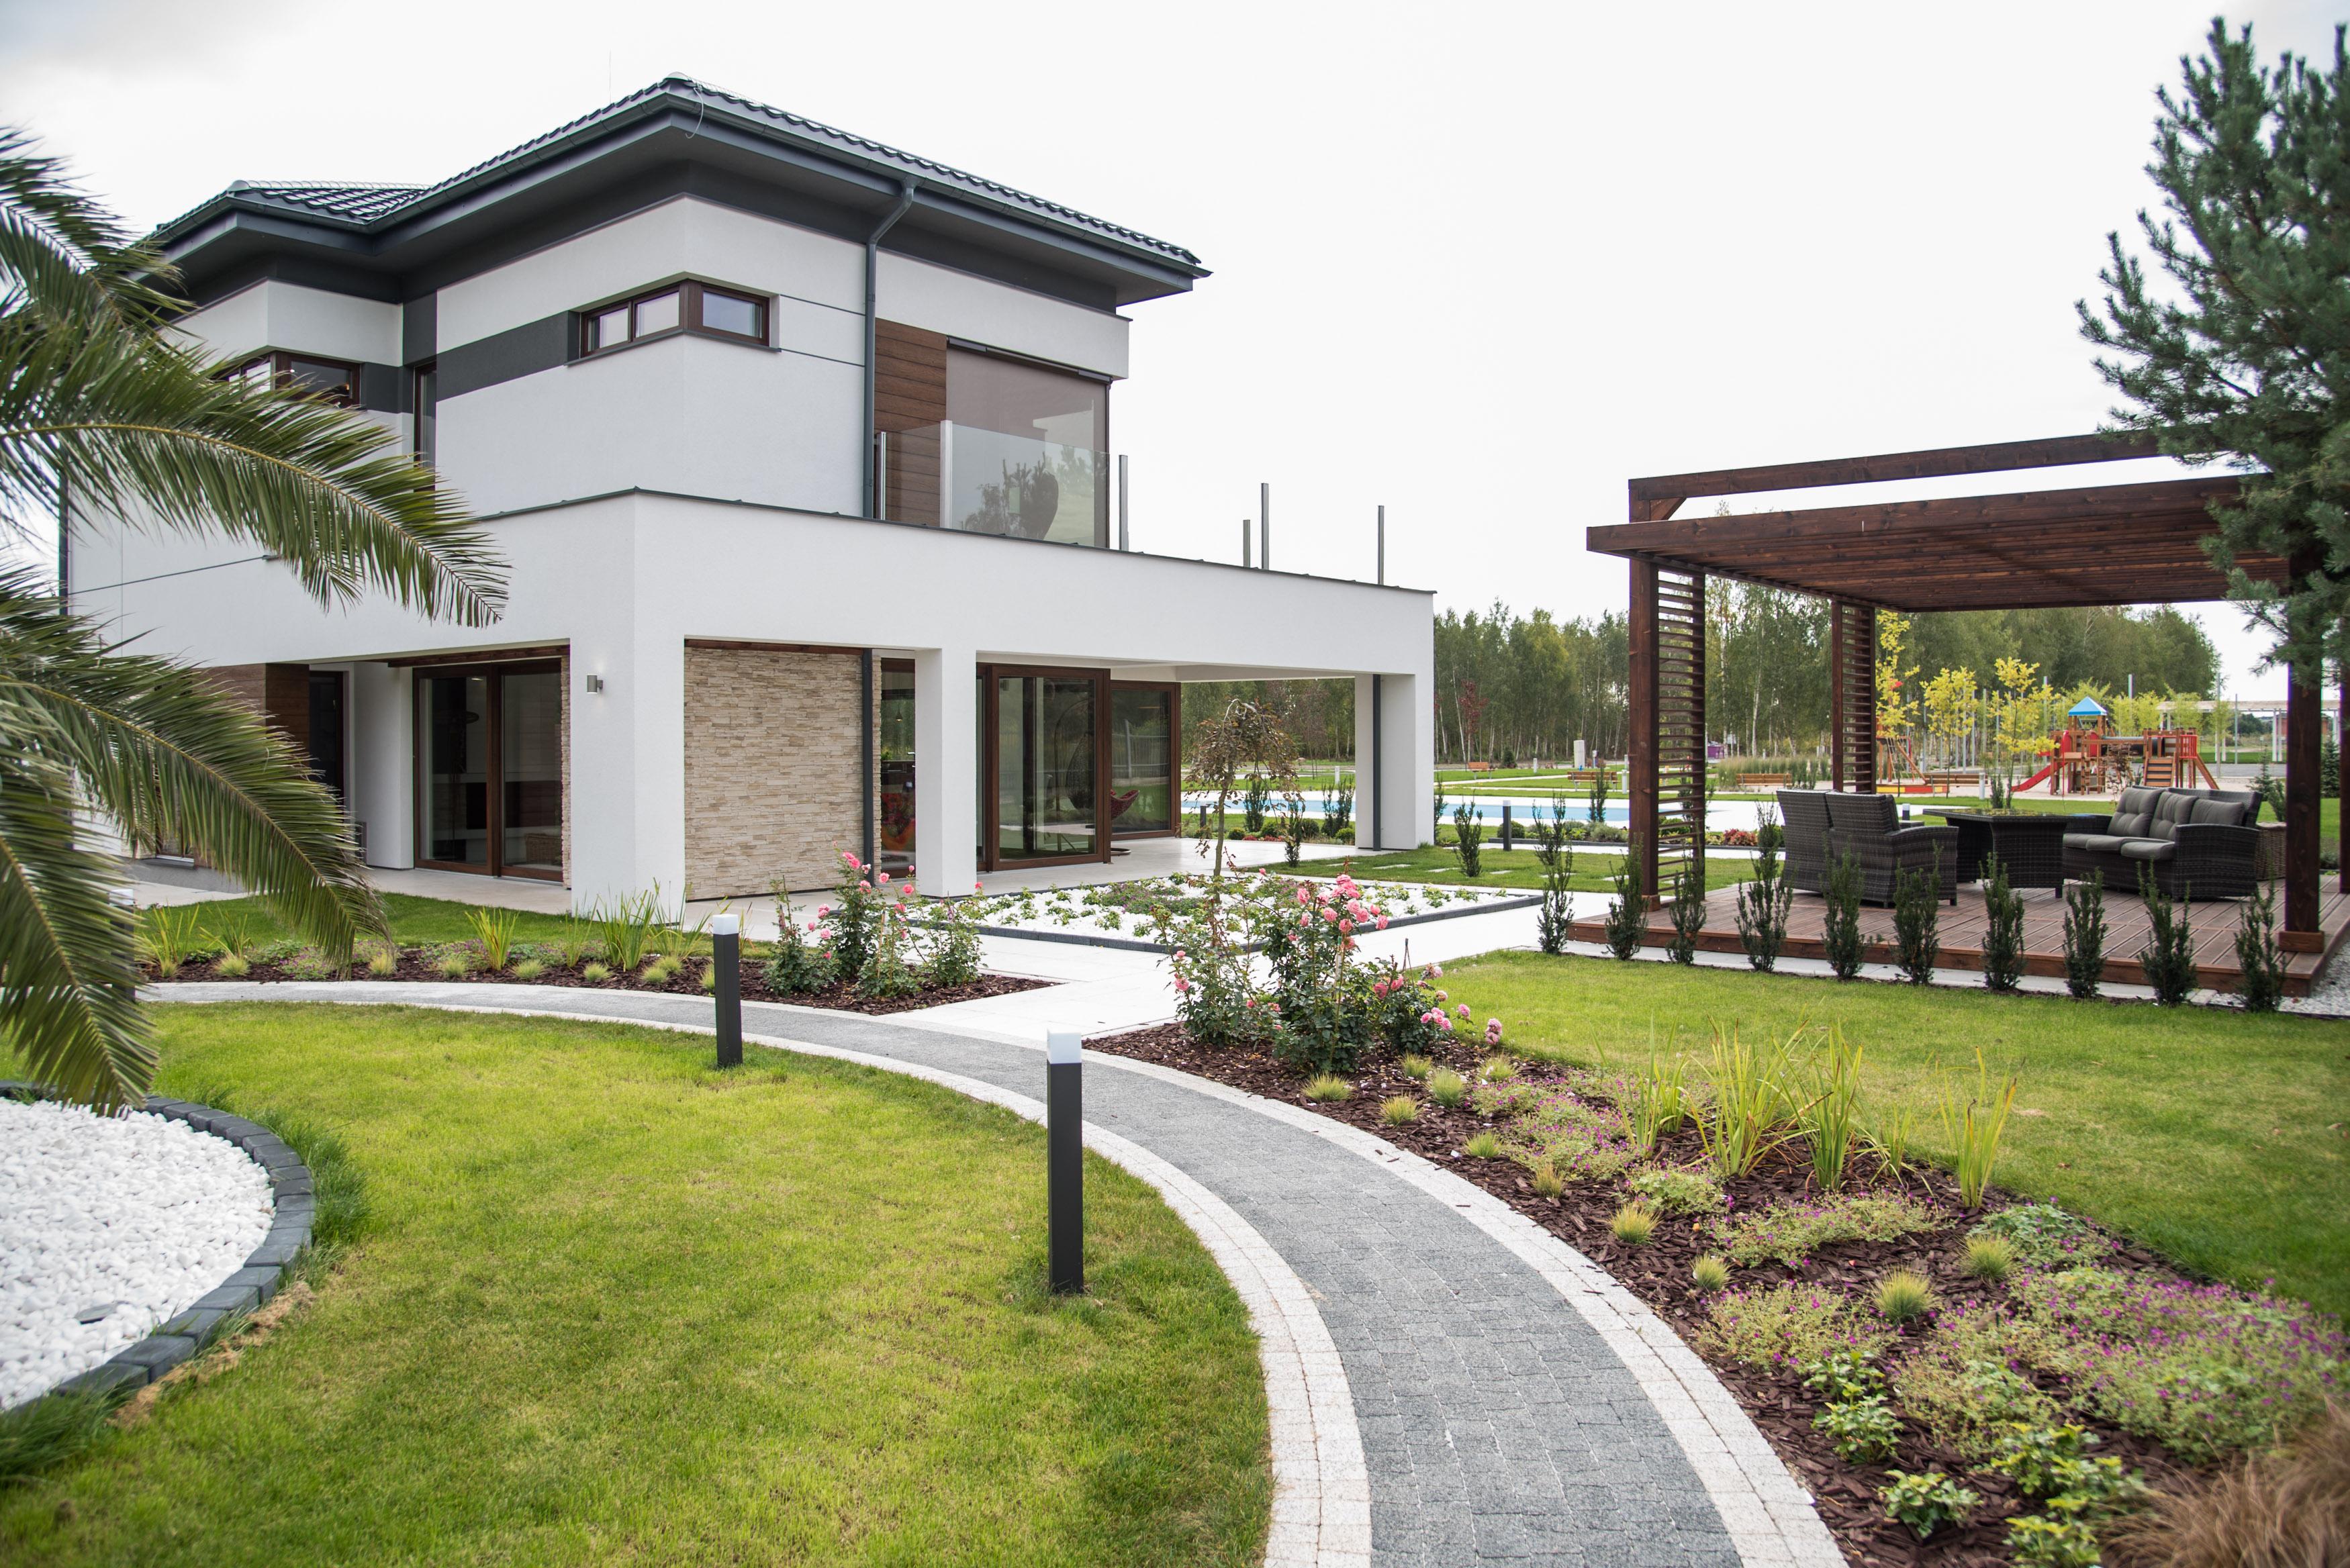 Wygodny i funkcjonalny dom od projektu